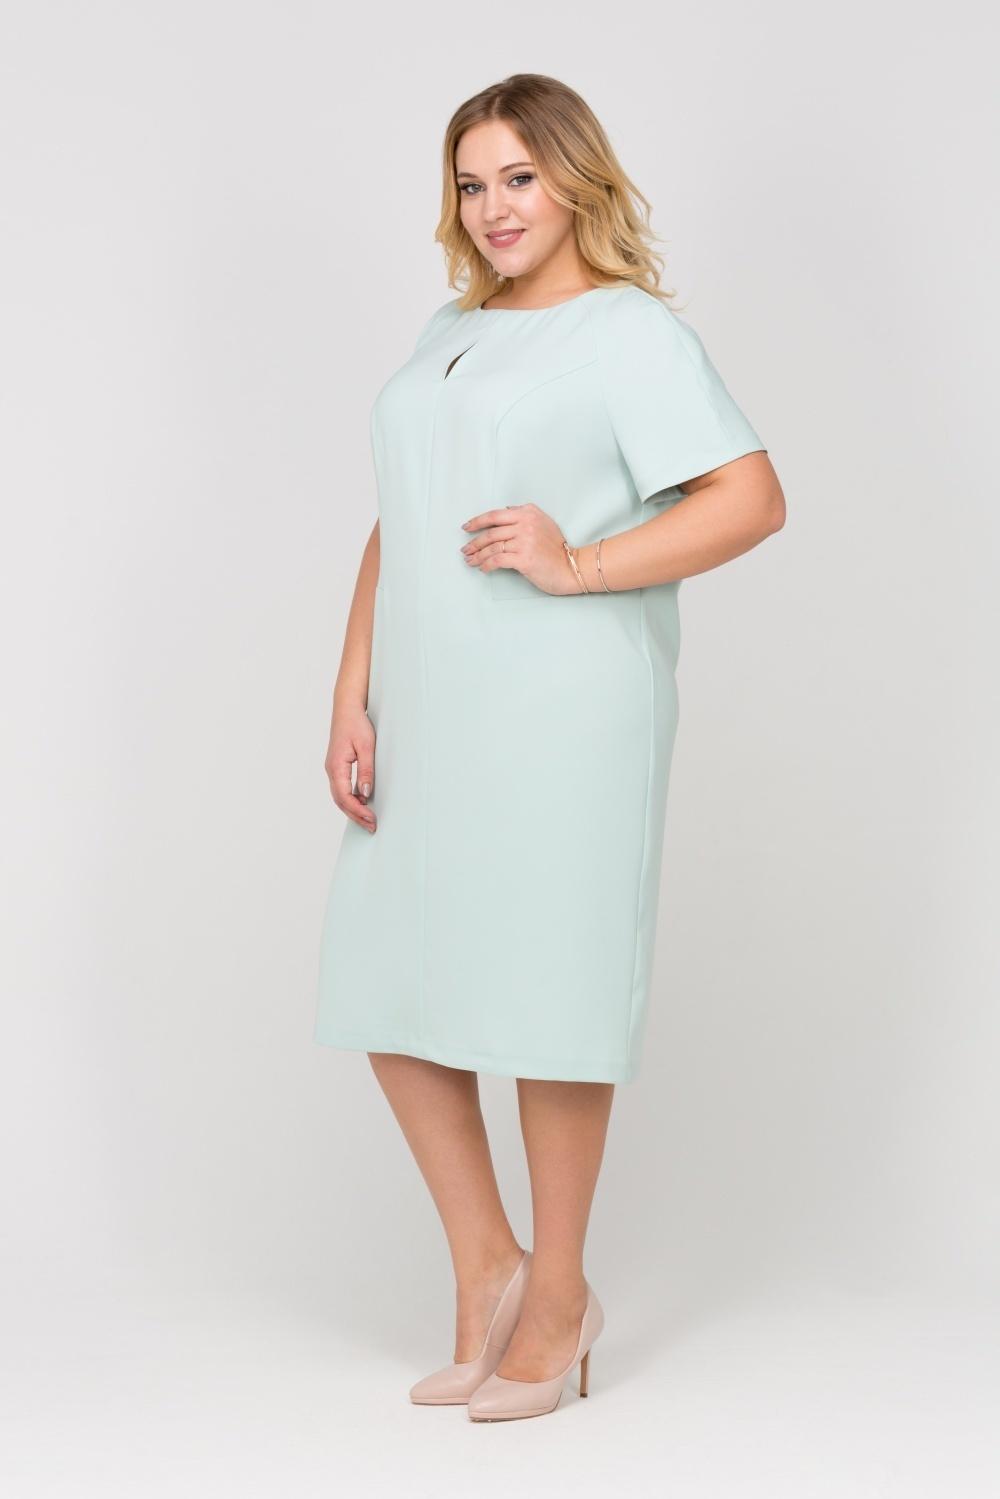 Платья Платье Линда мятный 7b81a16e71de8d0be9d104b5ef837064.jpg